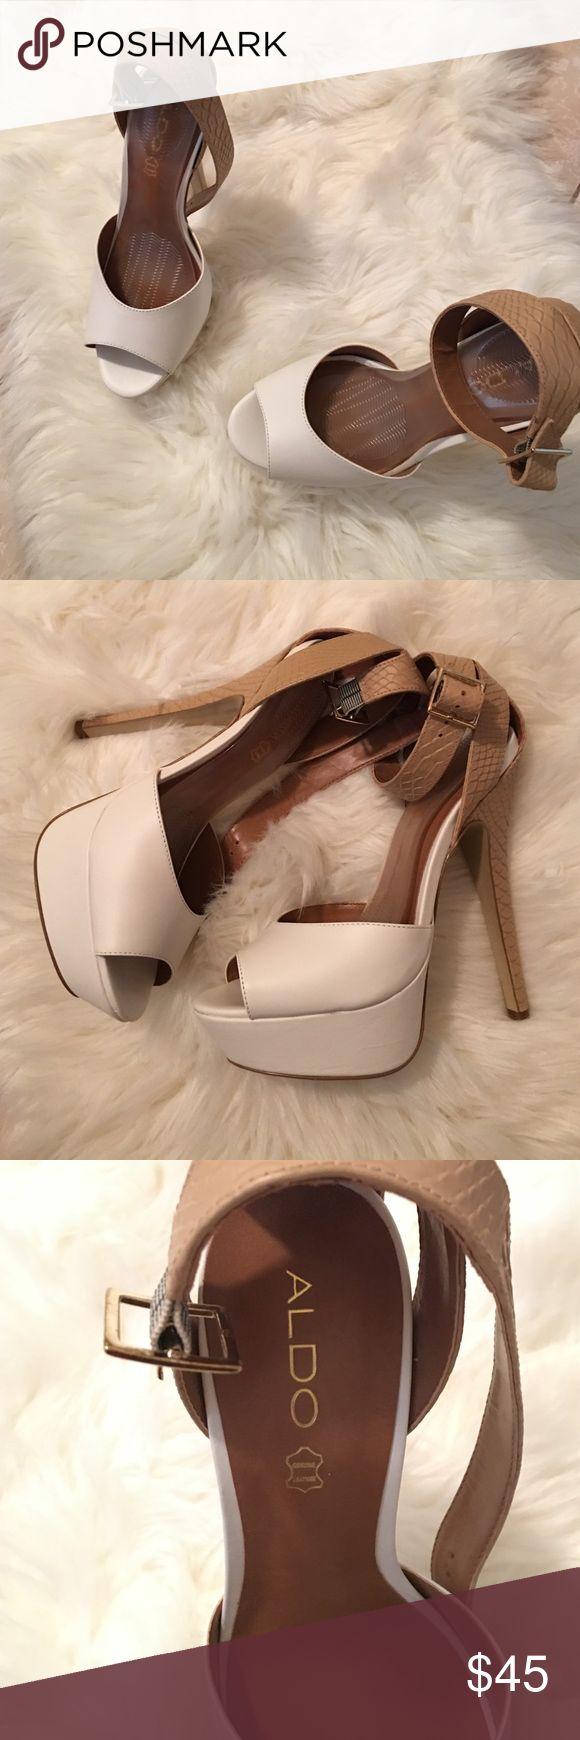 White Aldo heels 5 1/2 in ALDO heels Brand New. Size 8 1/2 ALDO Shoes Heels